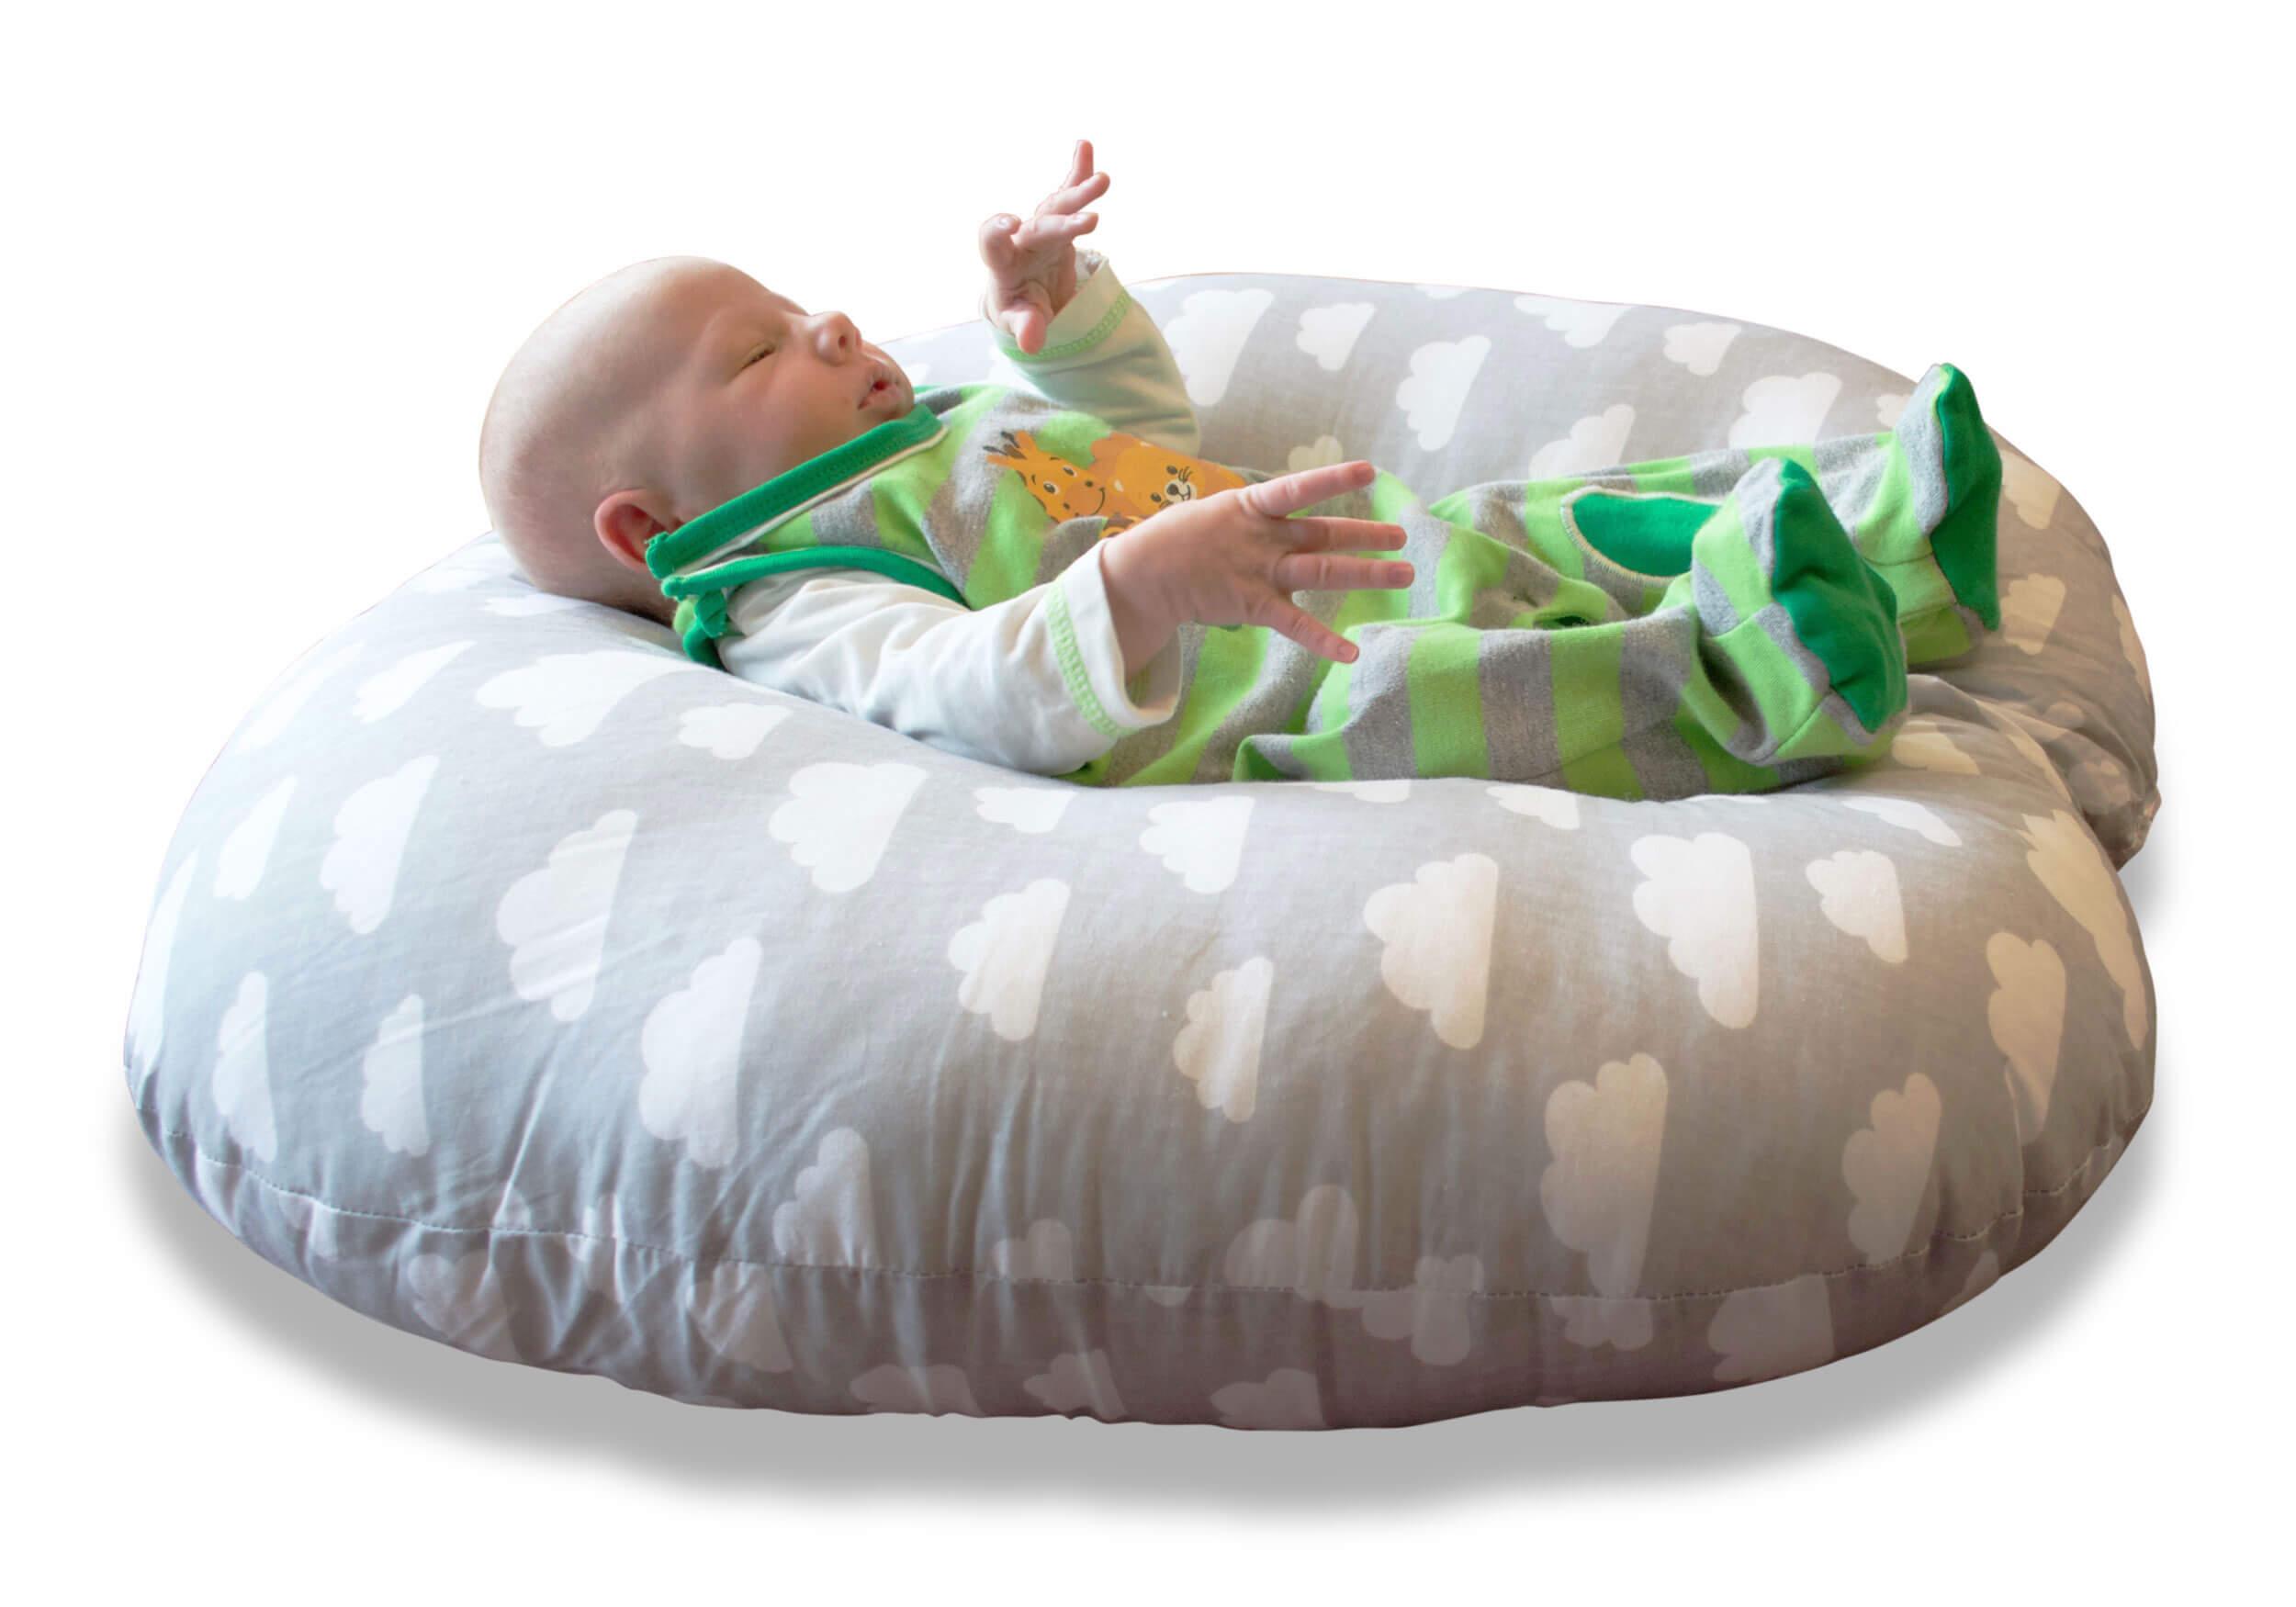 baby ab wann kopfkissen wandfarbe f r schlafzimmer ideen ikea inspo kinderriegel bettw sche. Black Bedroom Furniture Sets. Home Design Ideas